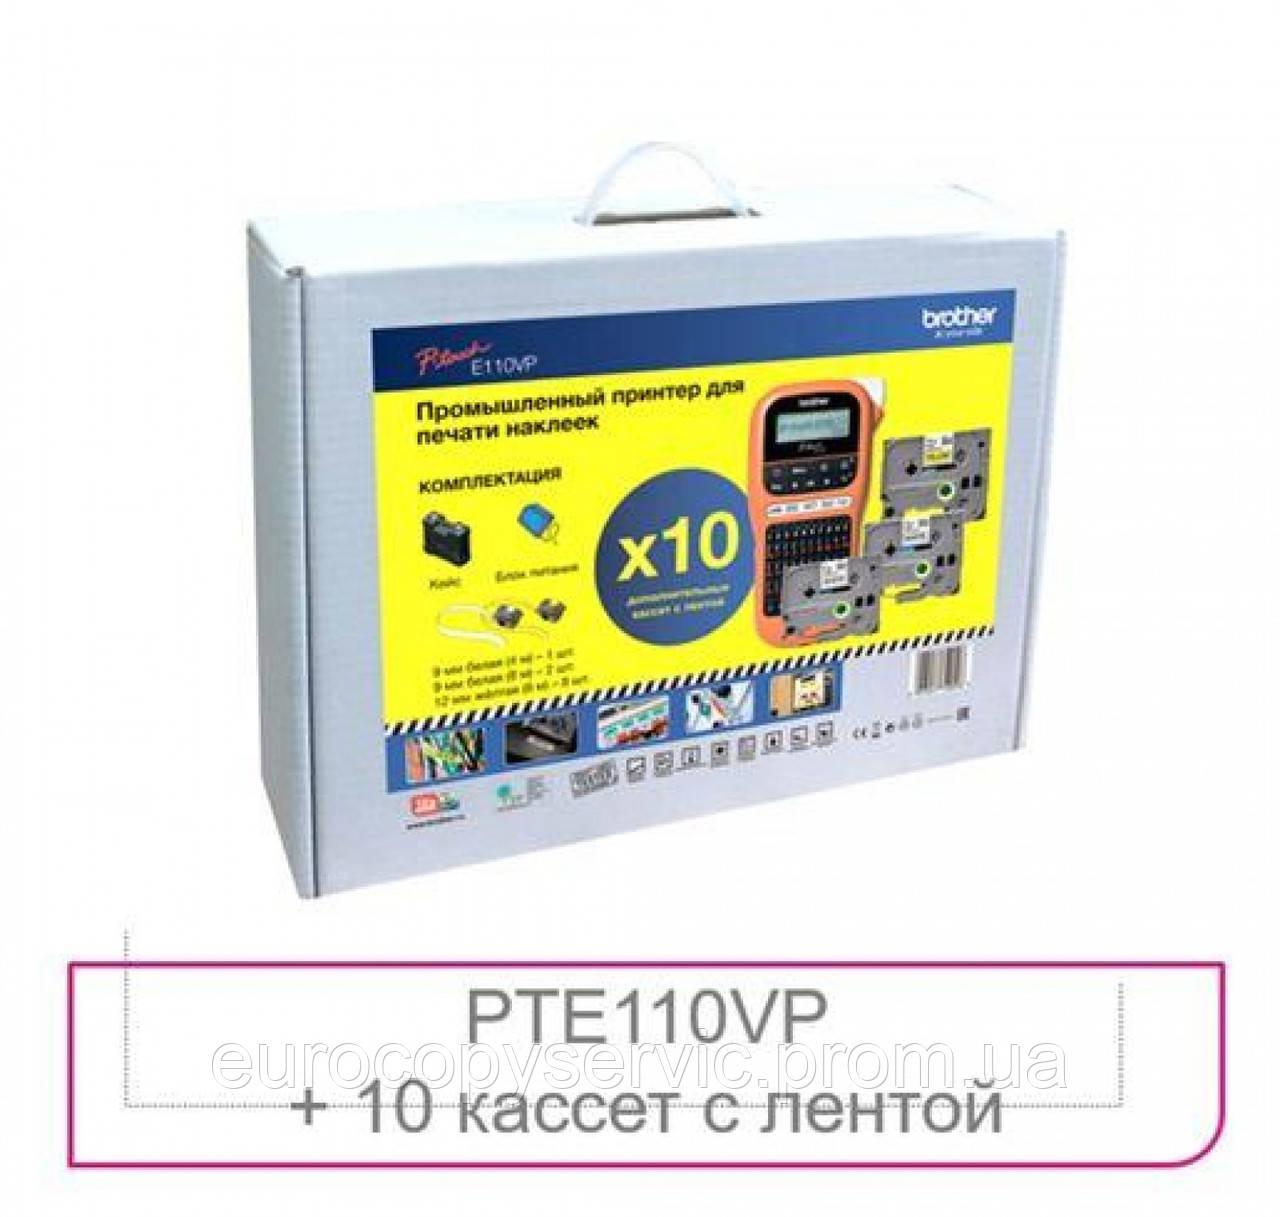 Принтер для друку наклейок Brother PT-E110VP в кейсі з додатковими витратними матеріалами (PTE110VPR1BUND)